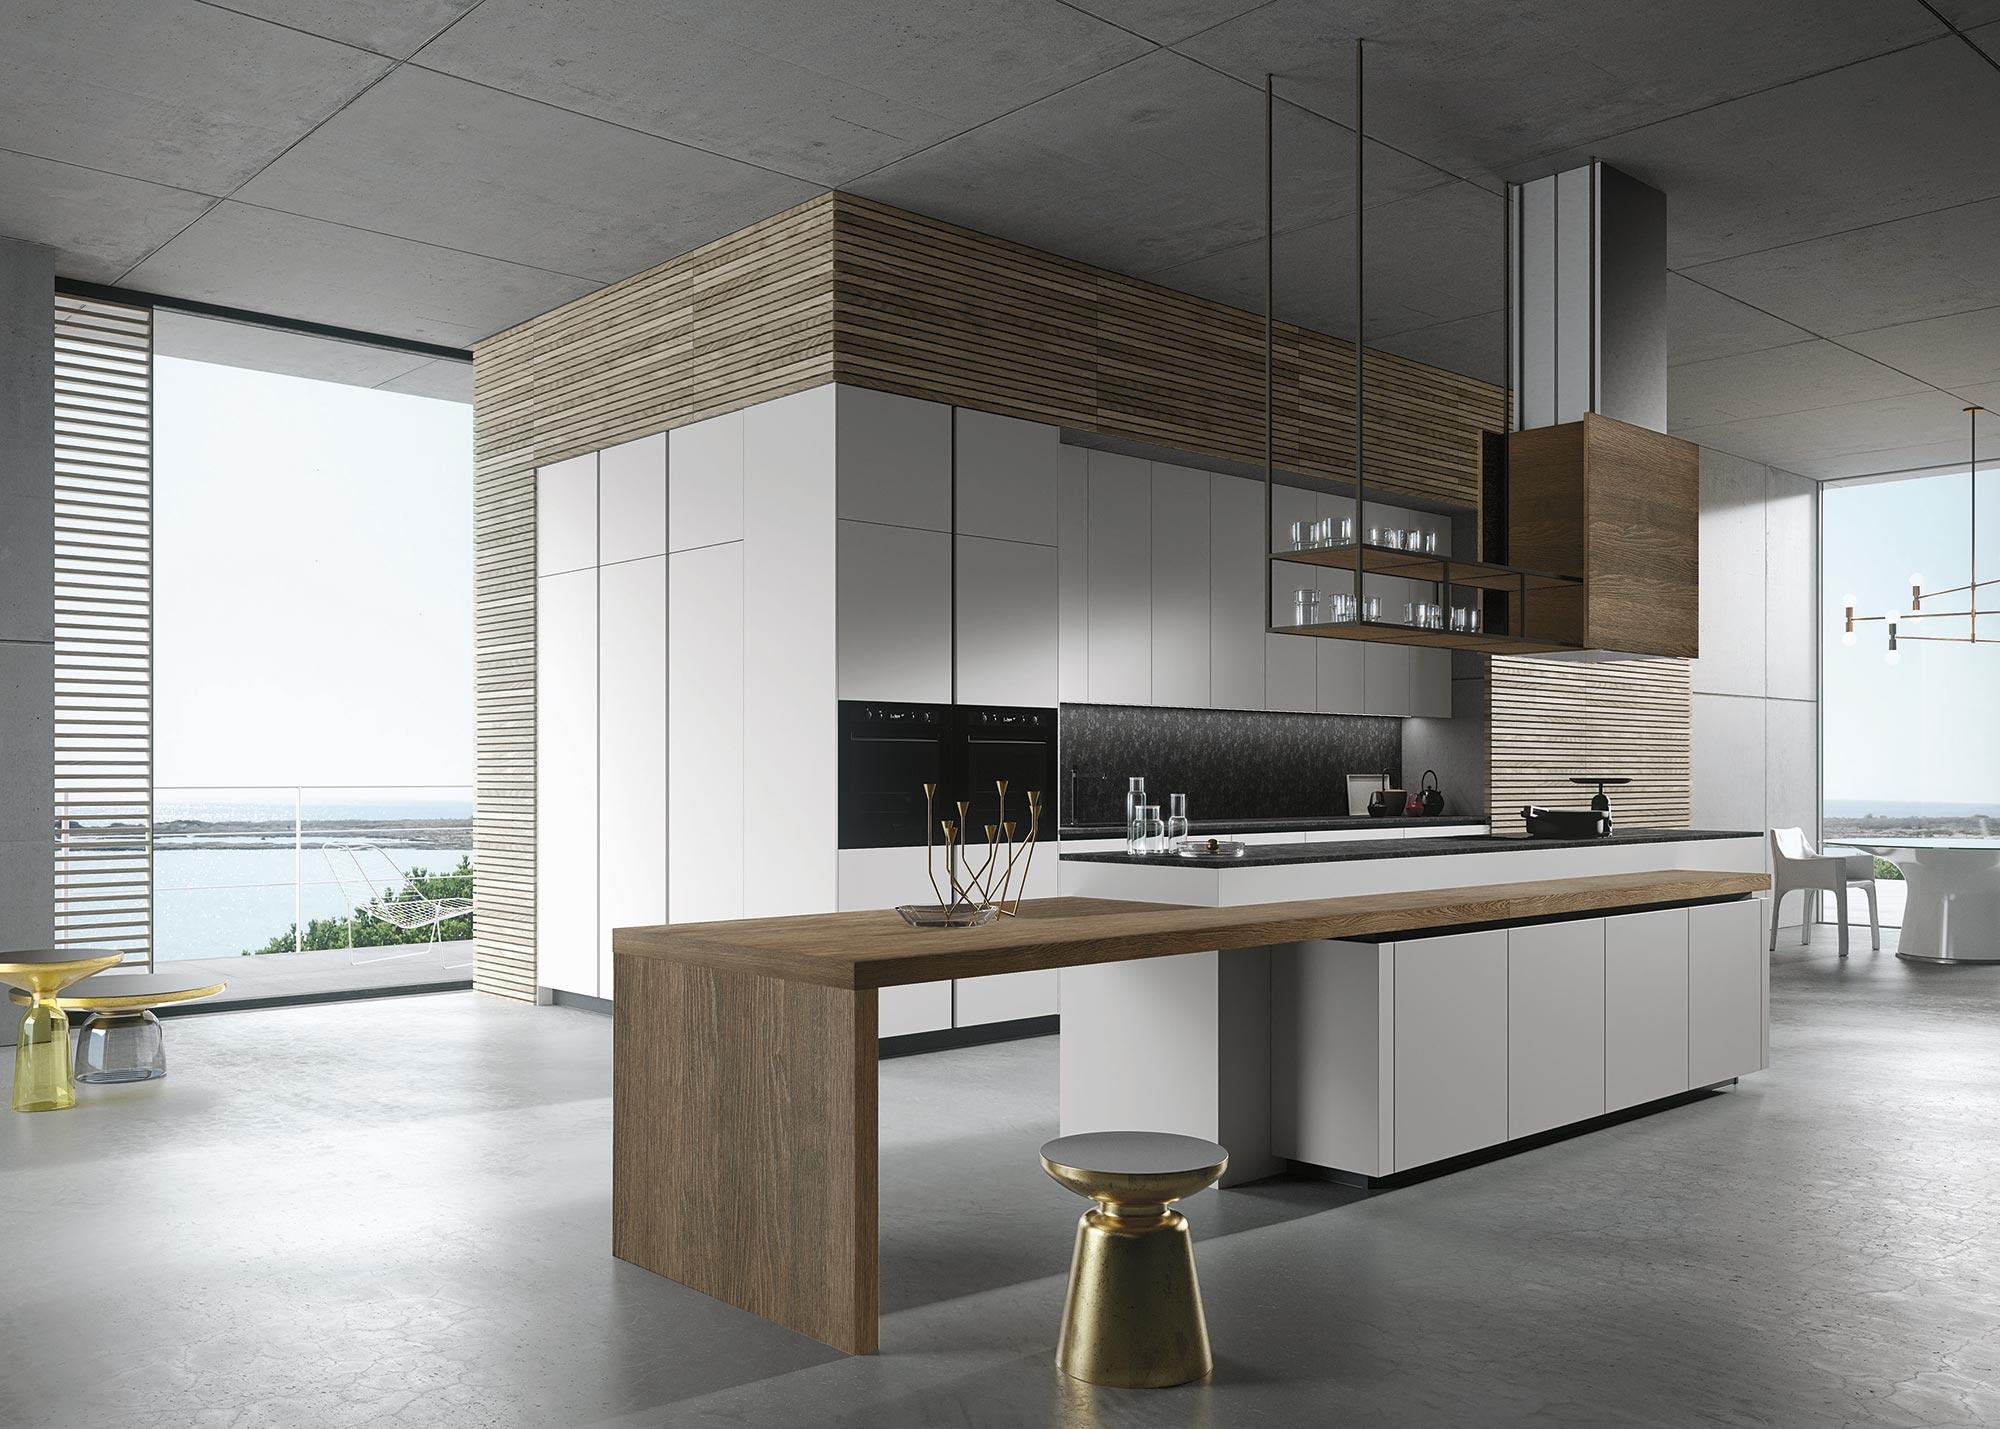 Cucine moderne eleganza sartoriale e contaminazione ville casali - Cucine snaidero moderne ...